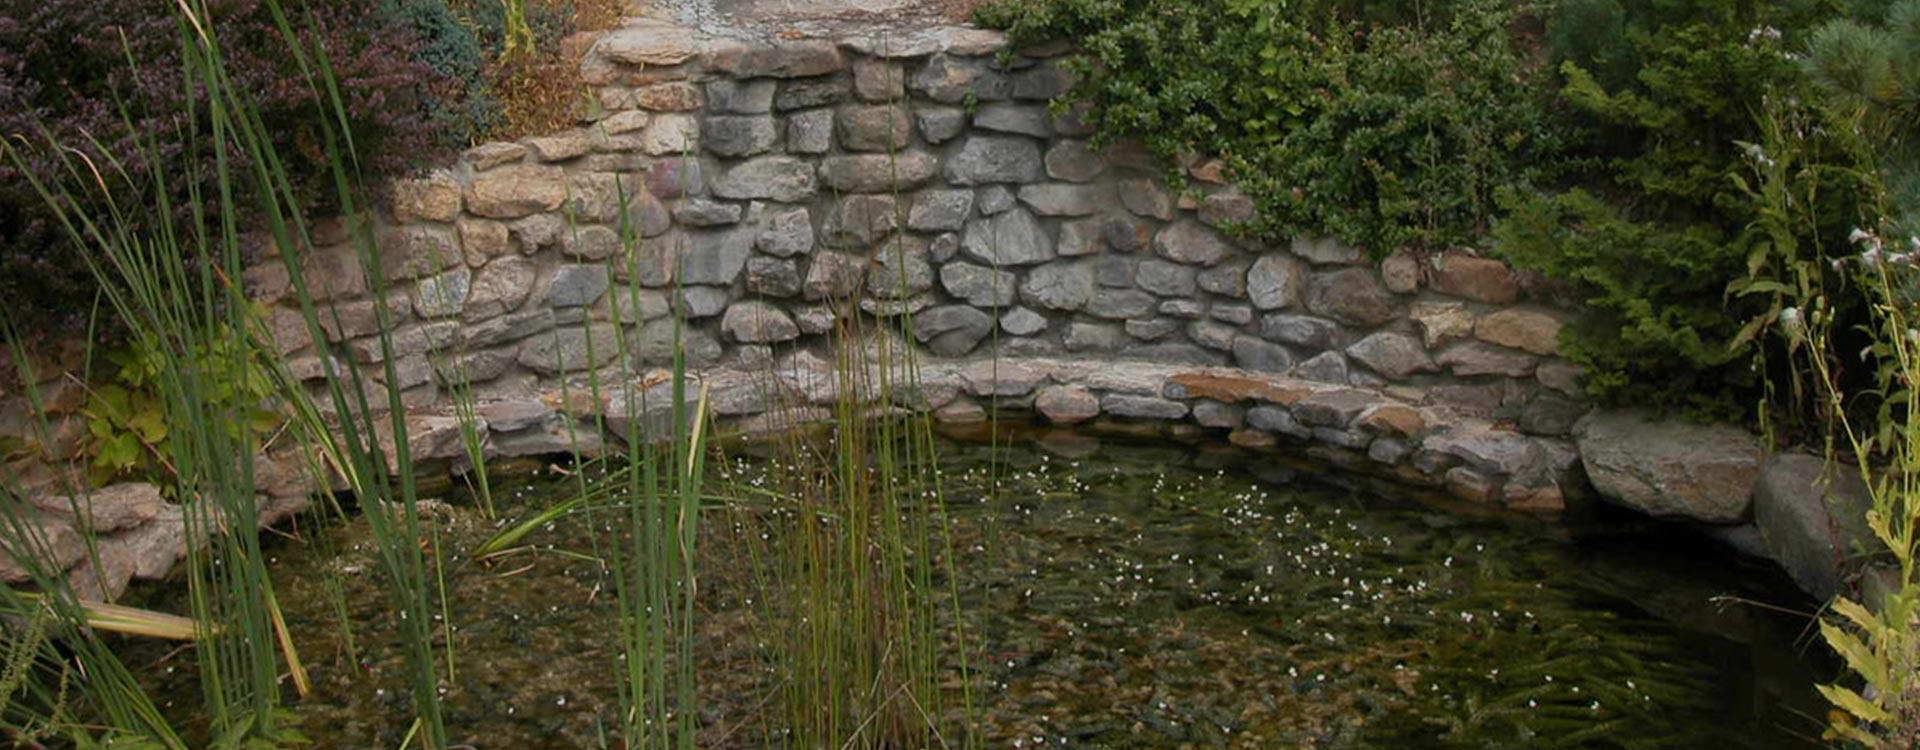 Indigo Pool Designs Glenside Pool Repair Pa 19038 Glenside Pool Construction Pa 19038 63